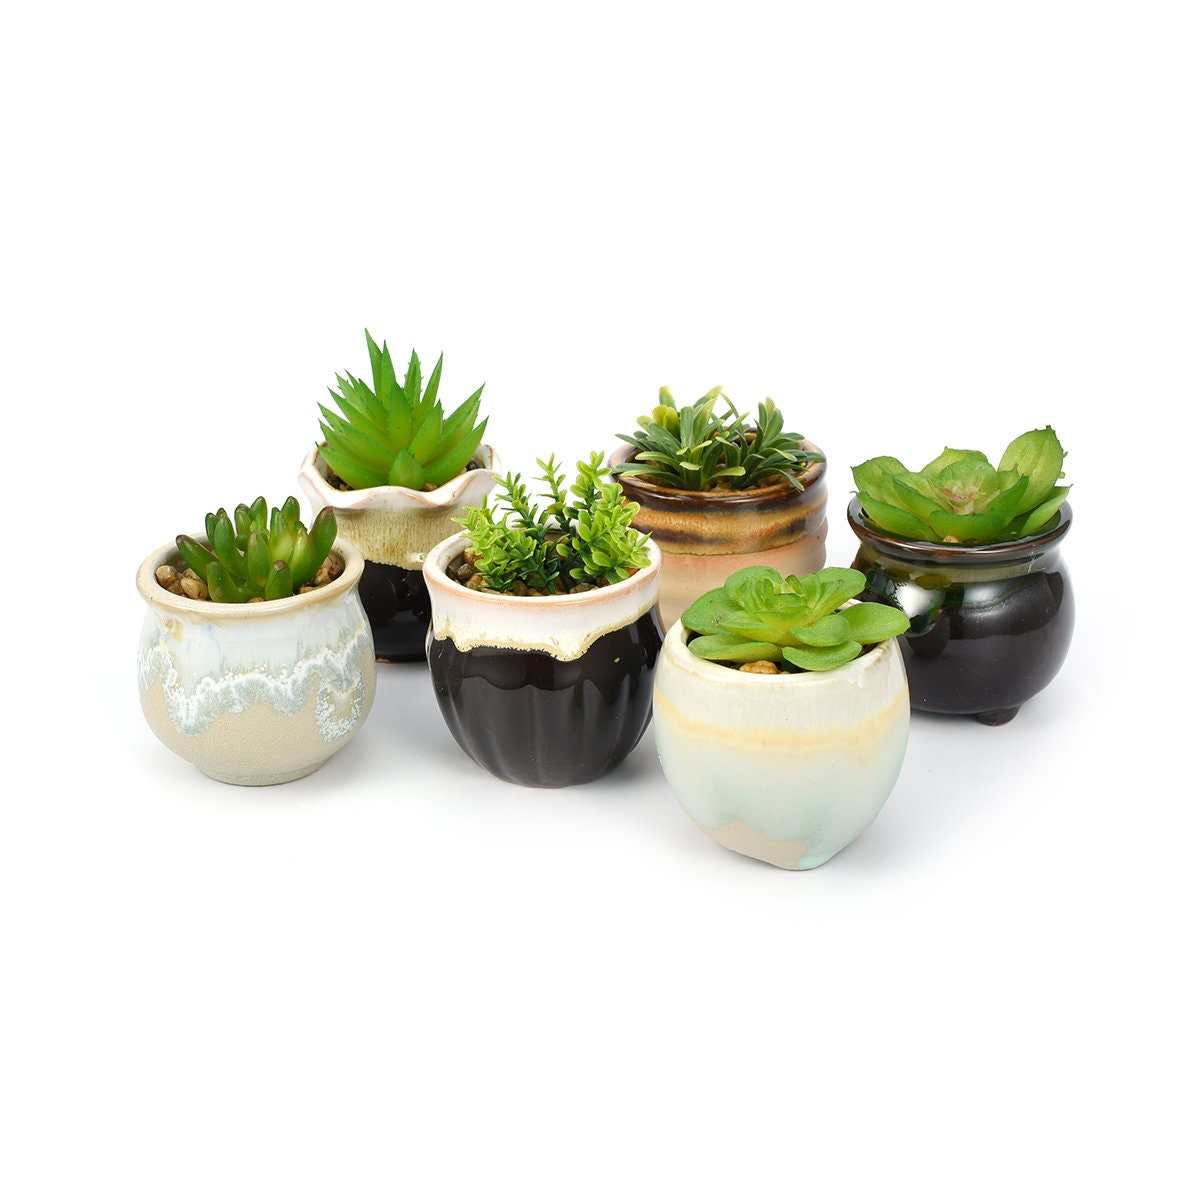 SET OF SIX Glazed Ceramic Planters, Succulent Planters, Small Ceramic  Planters, Glazed Pots, Small Ceramic Pots, Tiny Ceramic Vases